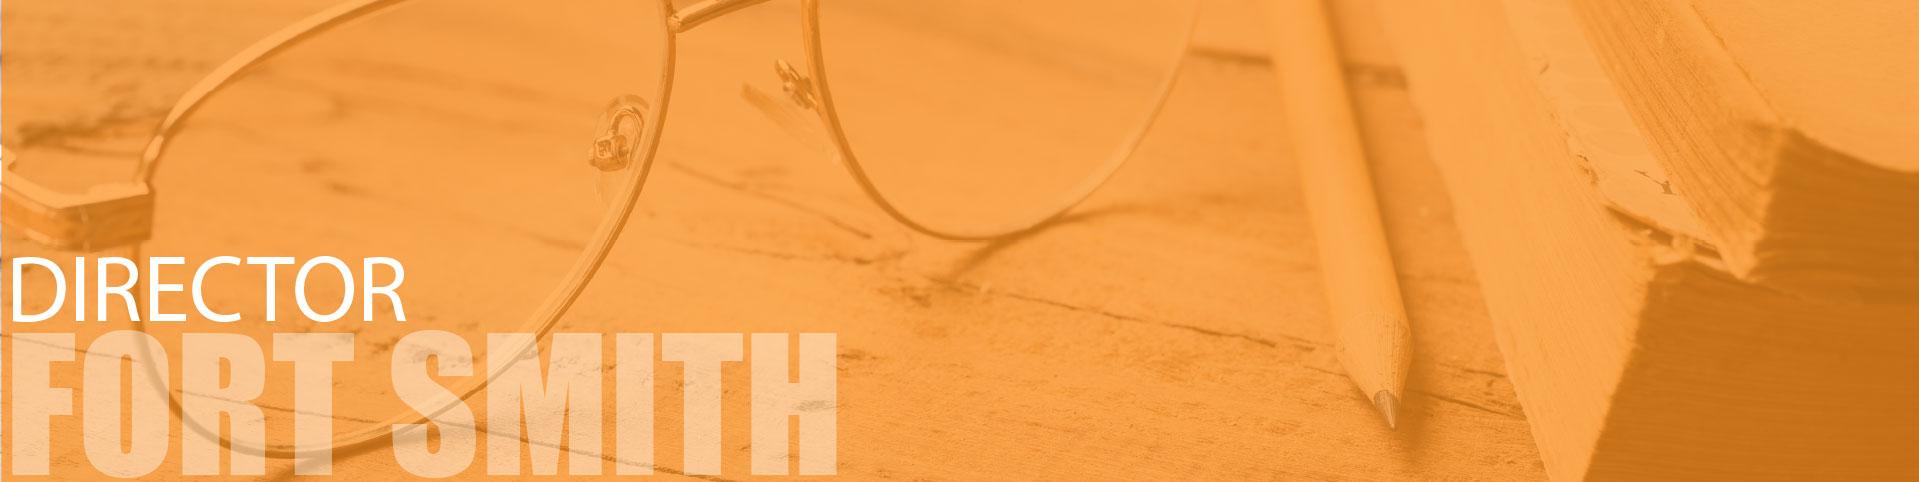 Director Header Image